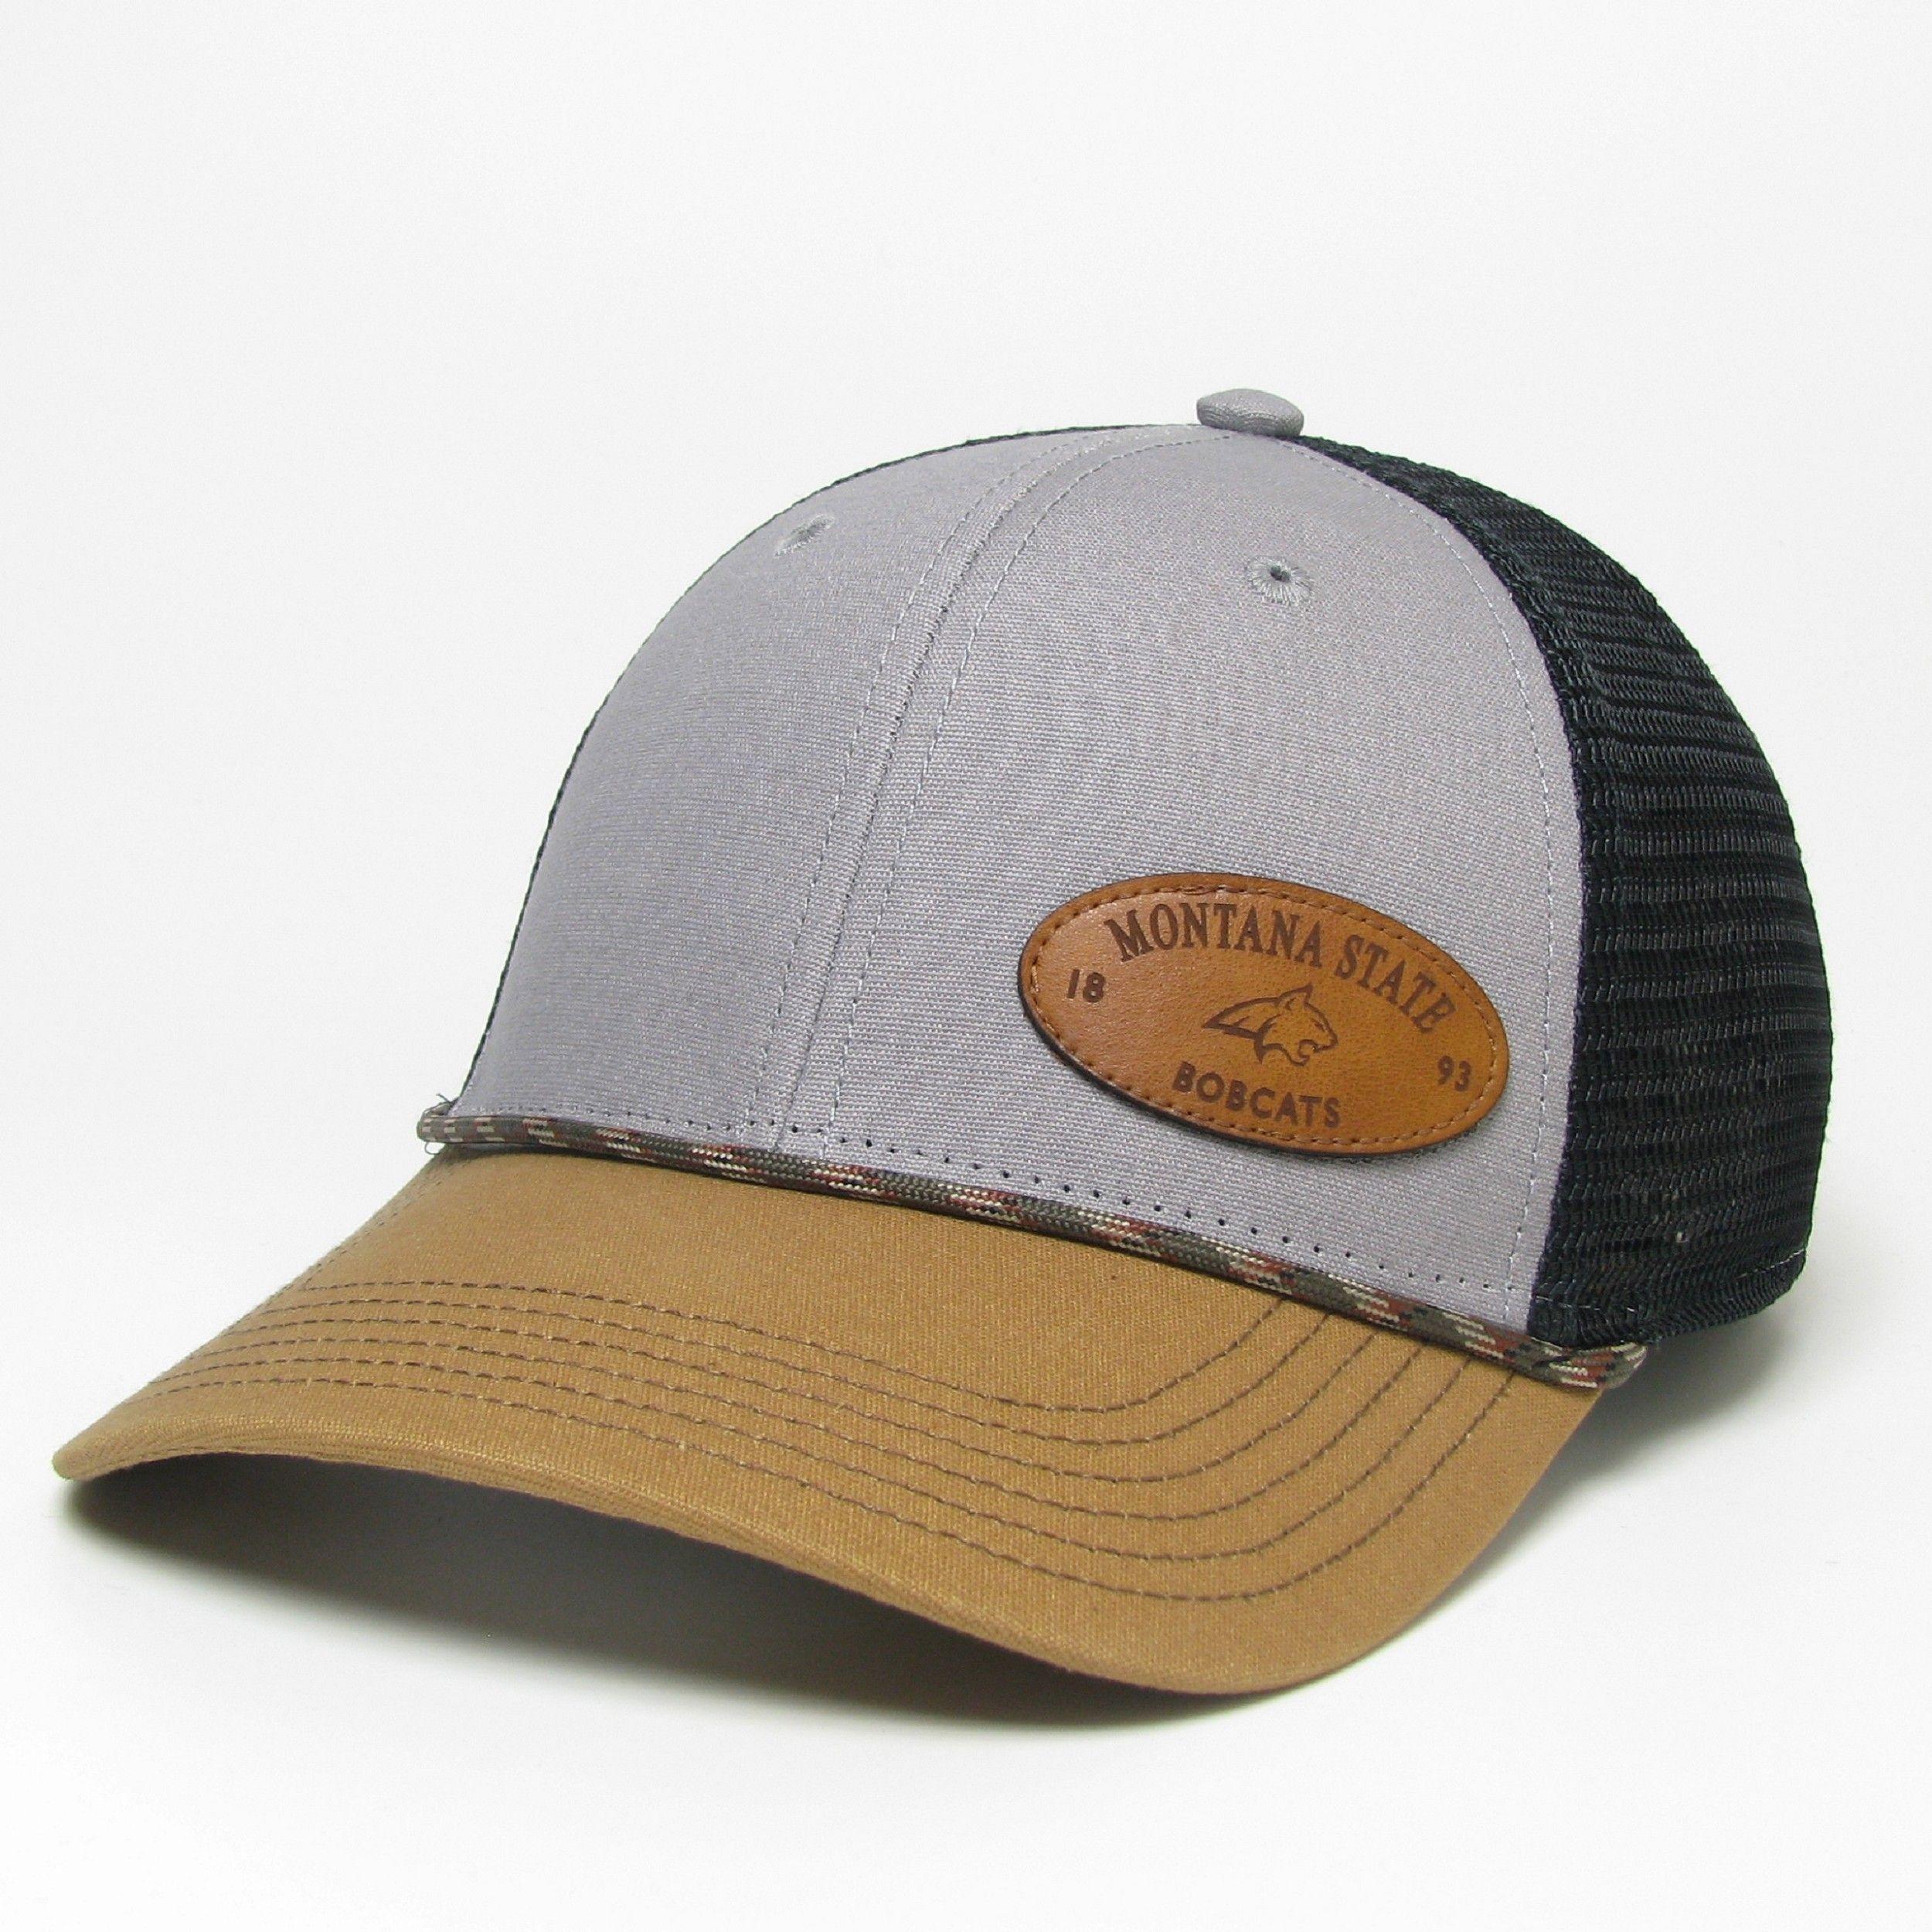 Legacy Montana State Bobcats Leather Logo Trucker Snapback Hat In 2020 Leather Snapback Hats Montana State University